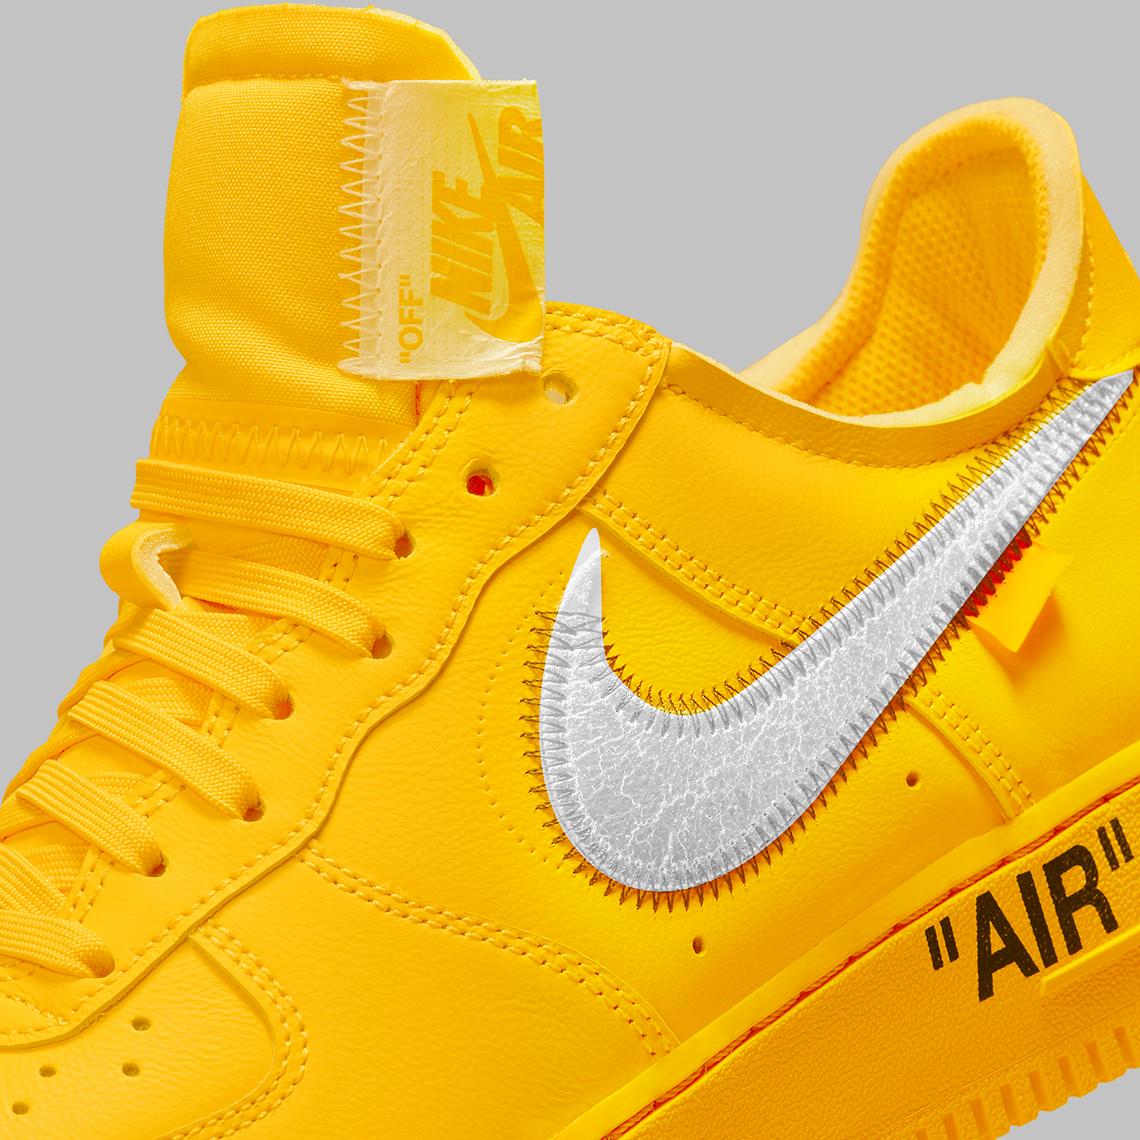 Off-White Nike Air Force 1 Yellow Lemonades Raffle   SneakerNews.com